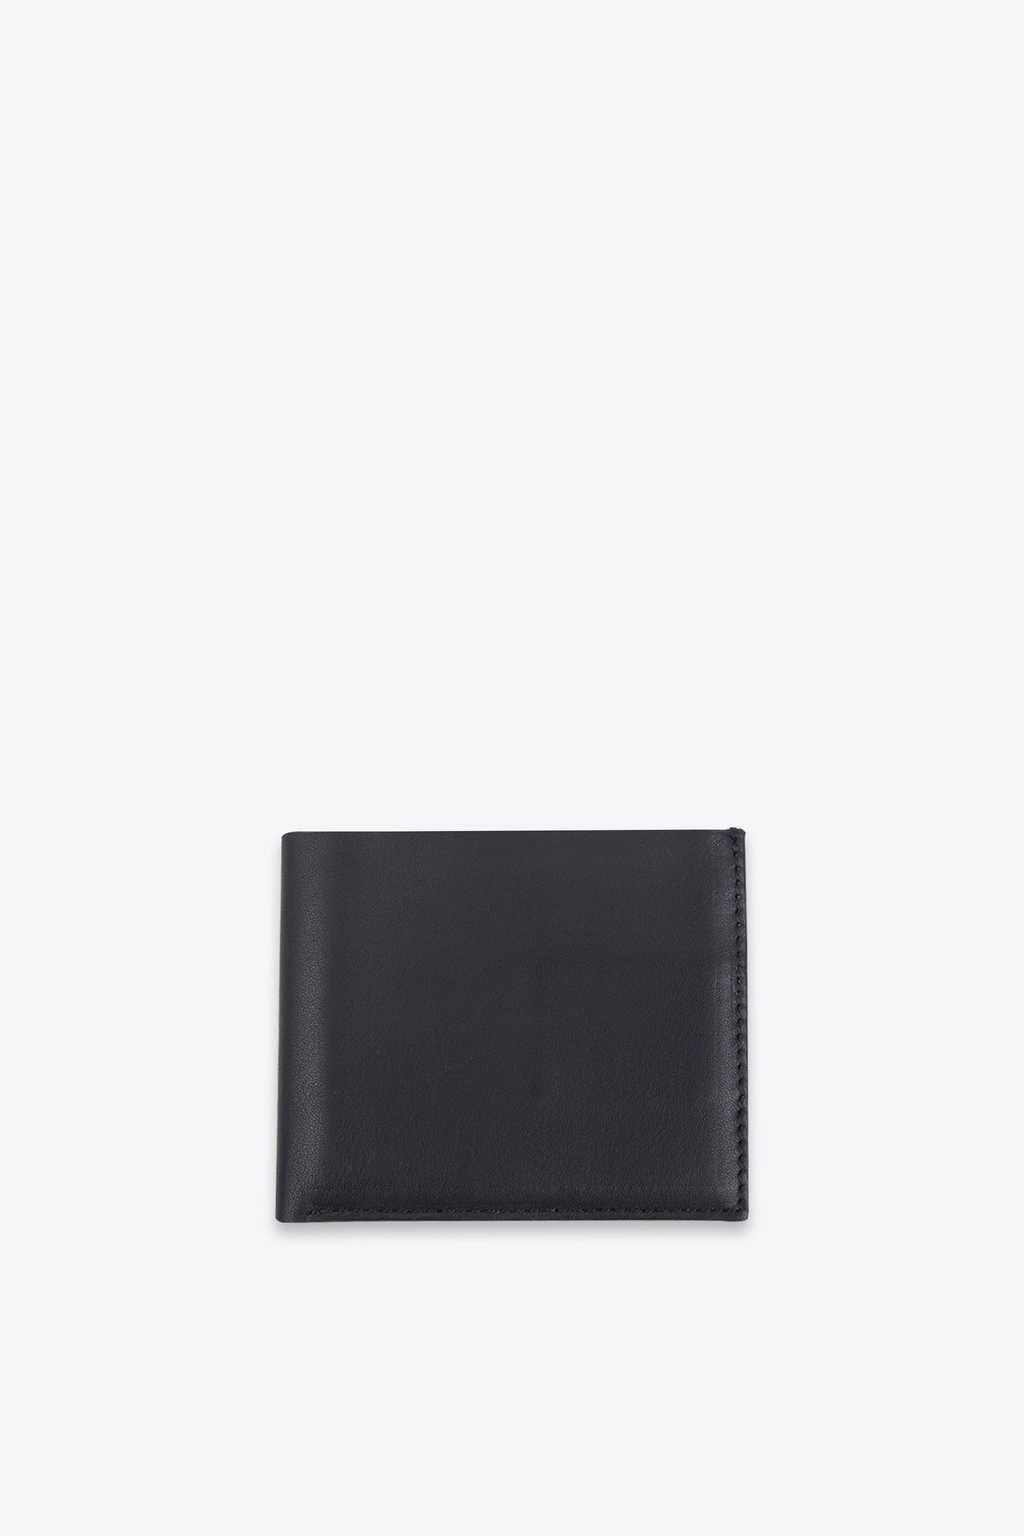 Wallet 1256 Black 5